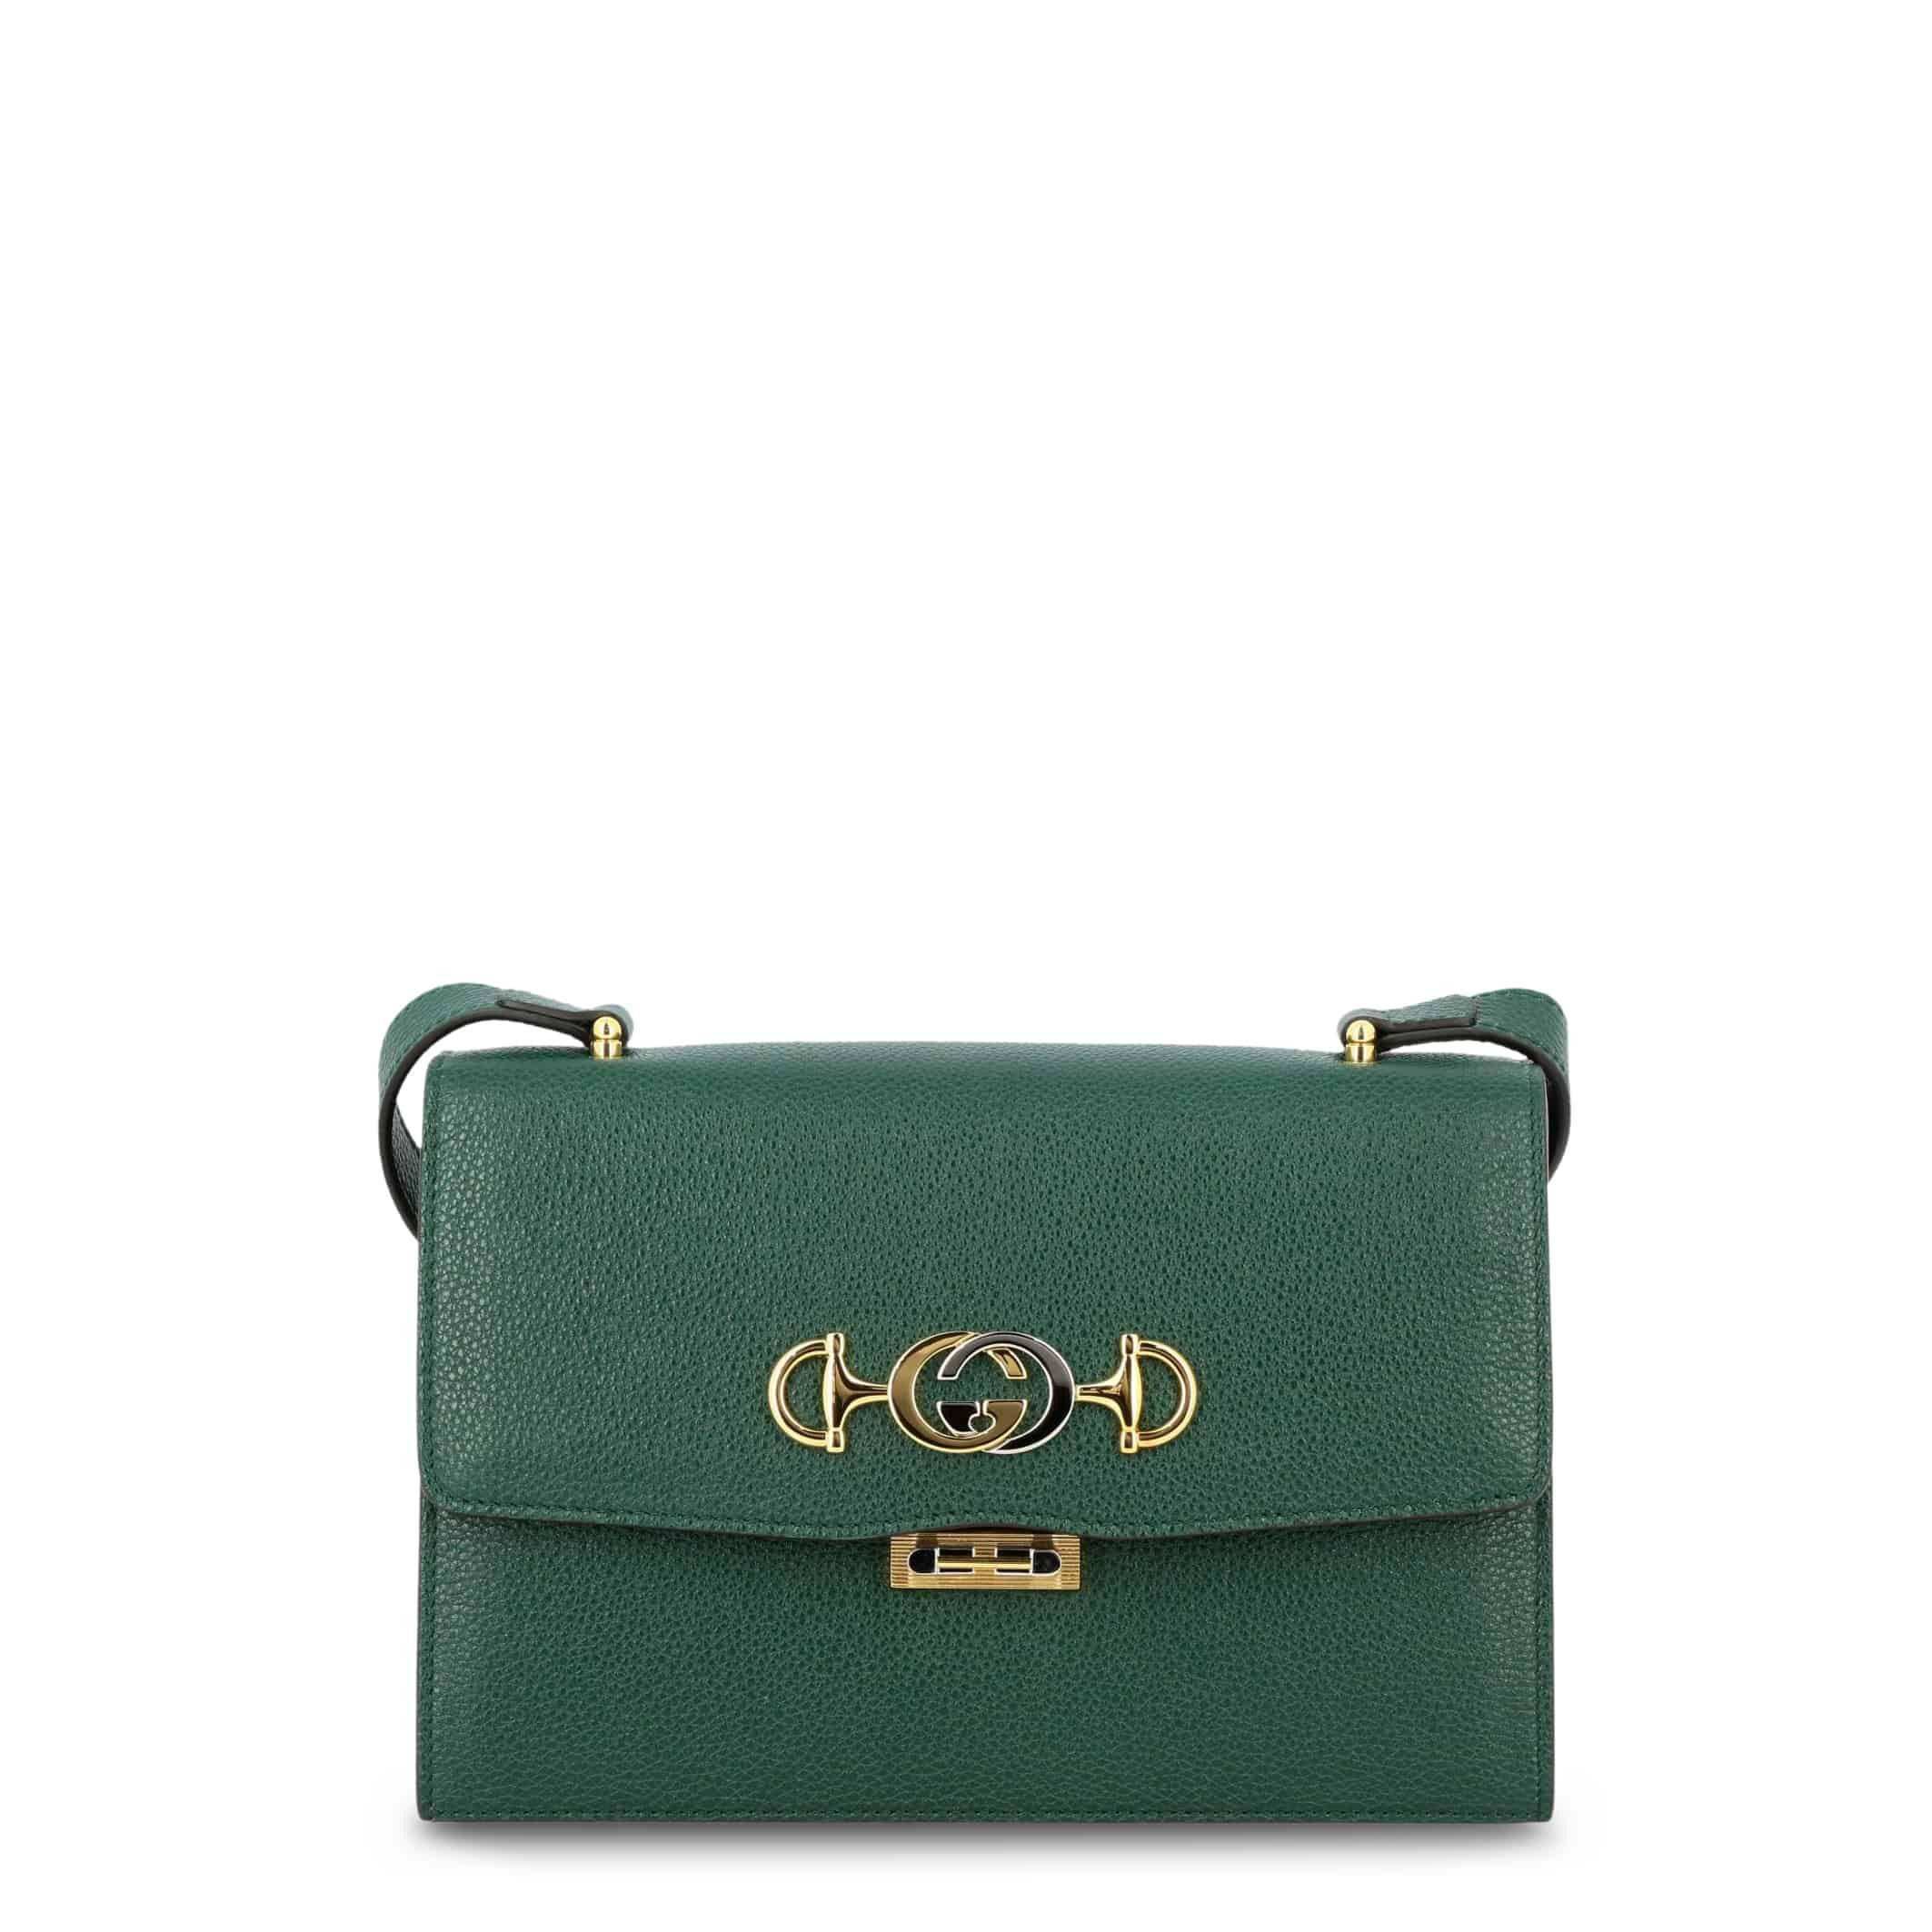 Gucci – 576388_1B90X – Verde